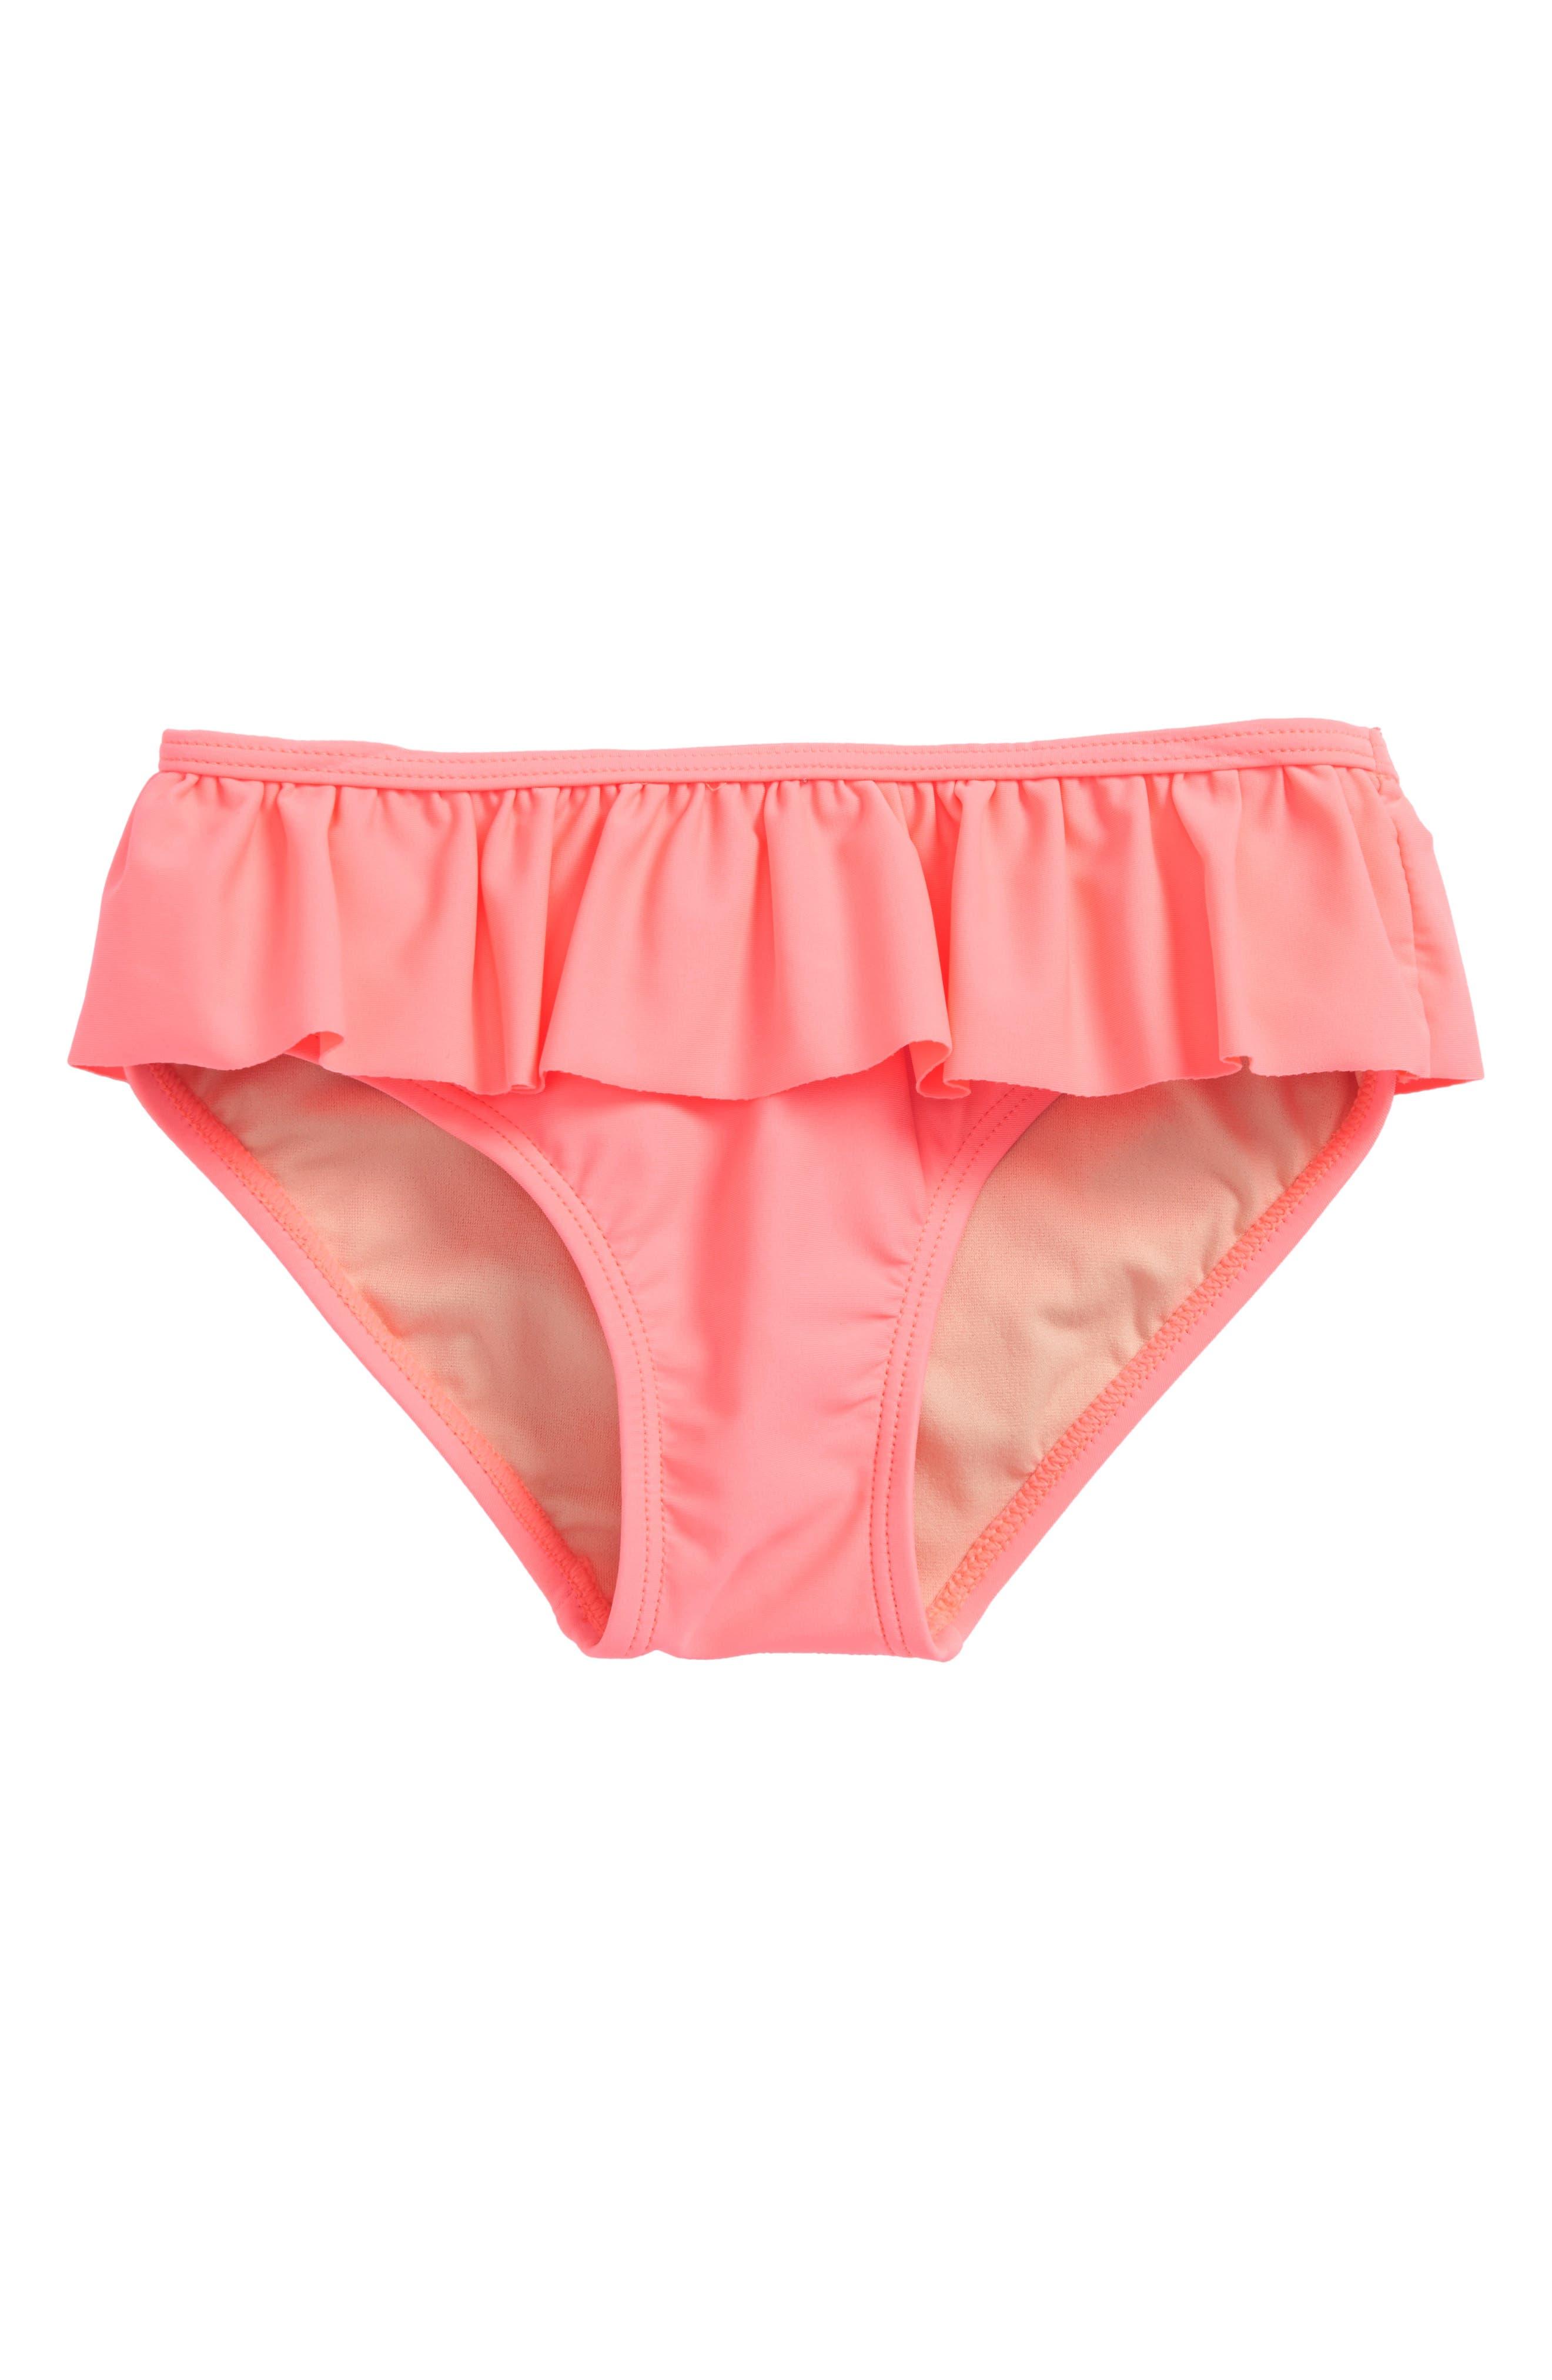 Solid Ruffle Bikini Bottoms,                             Main thumbnail 1, color,                             699